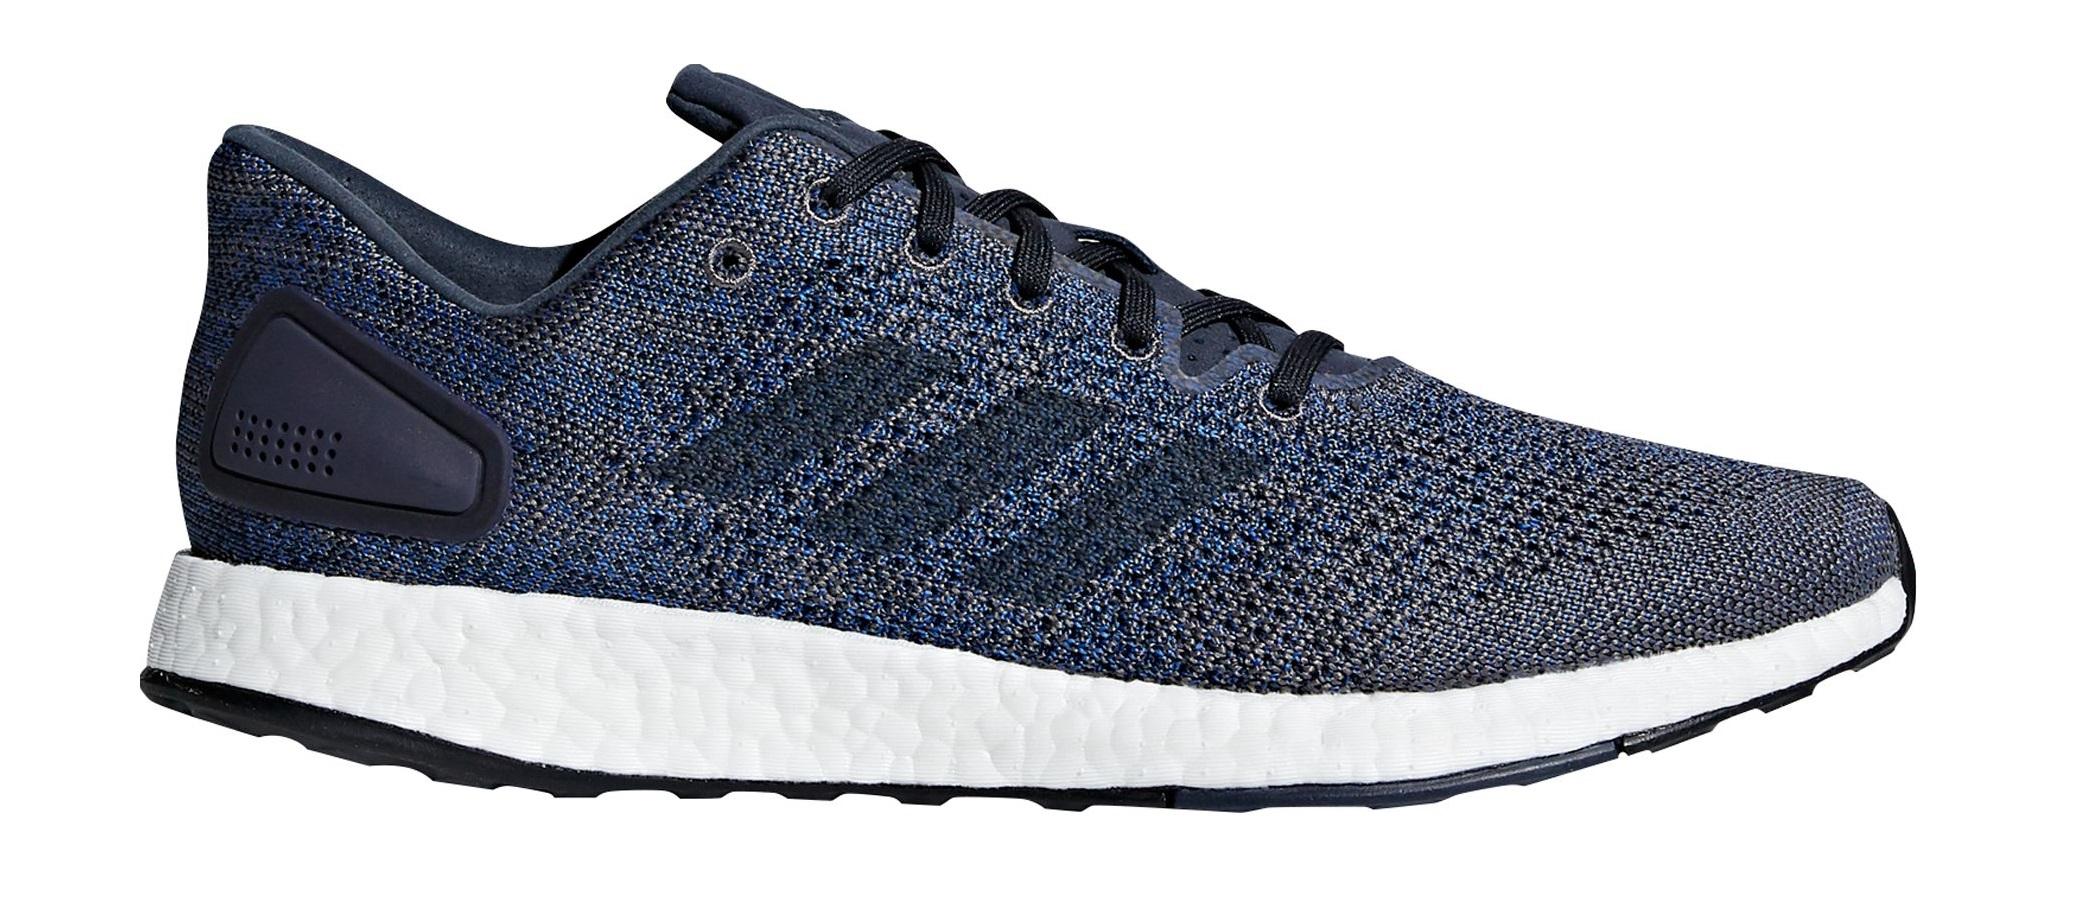 Adidas Pureboost DPR